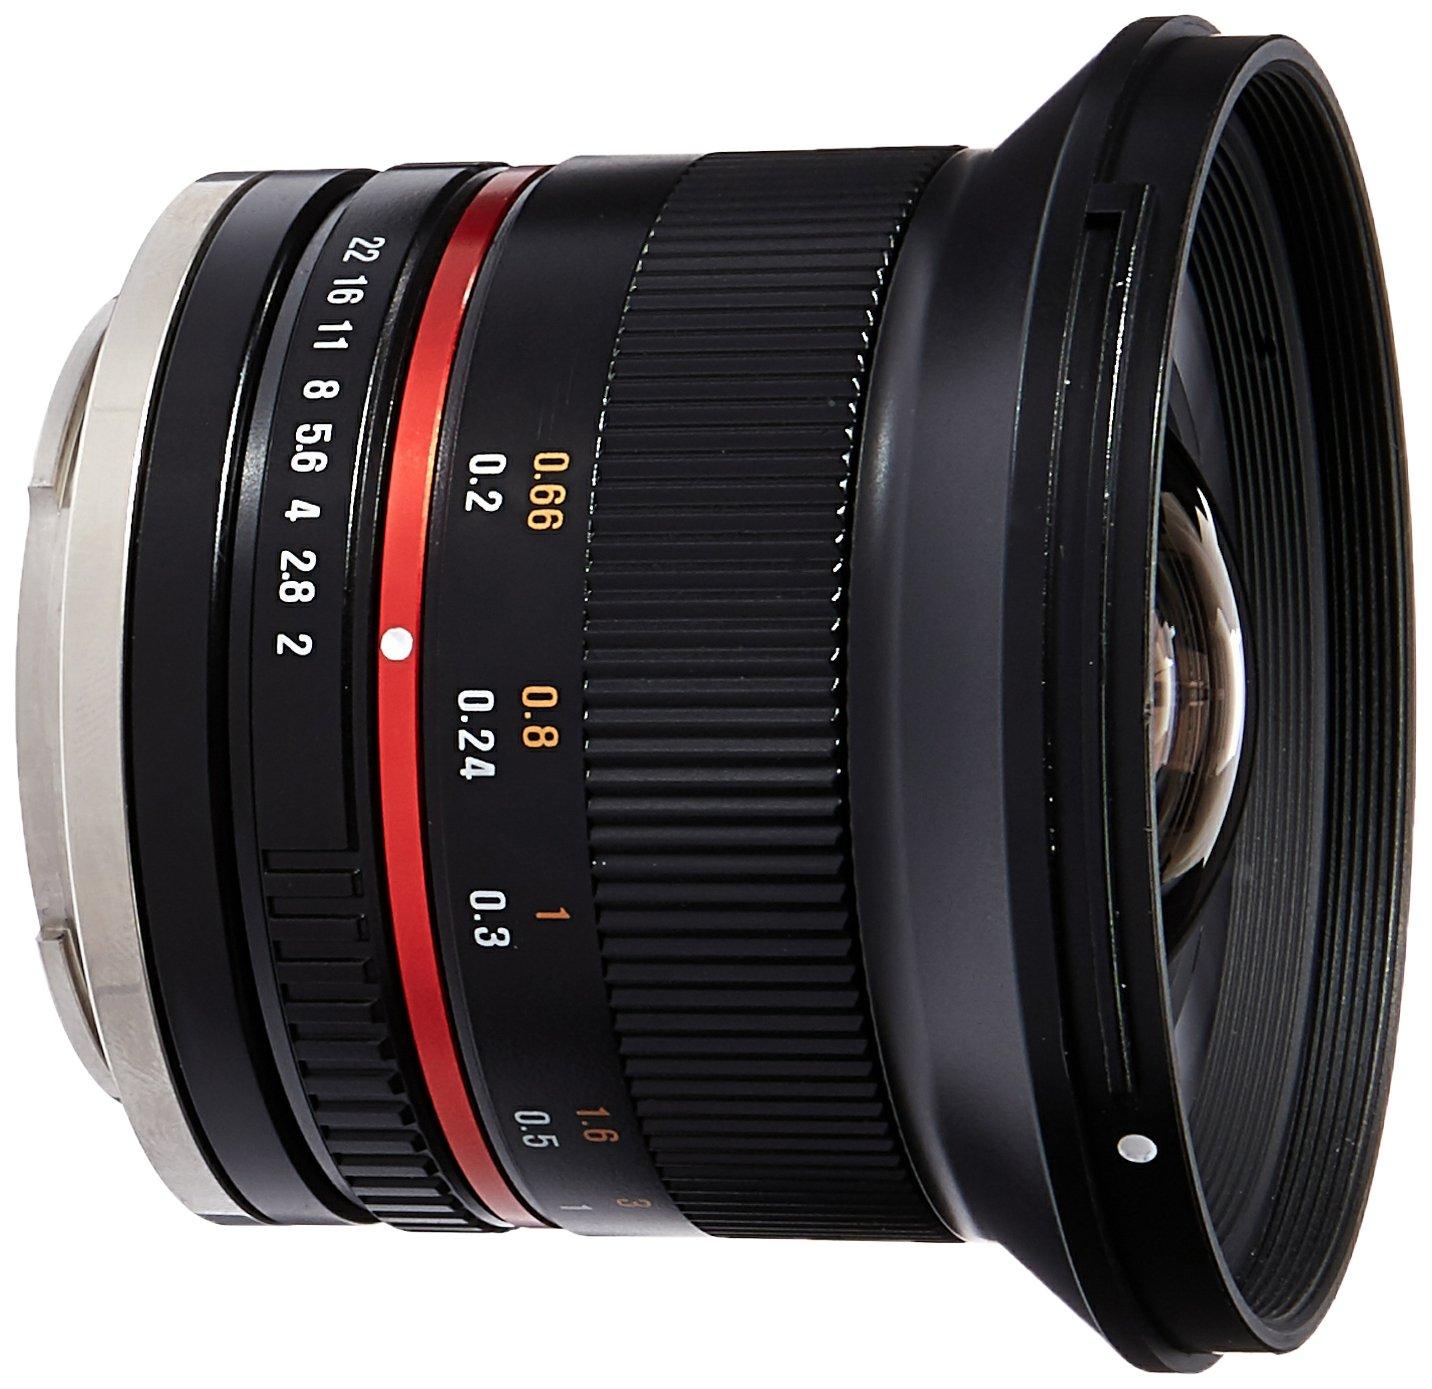 Samyang SY12M-E-BK 12mm F2 0 Ultra Wide Angle Lens for Sony E Cameras, Black